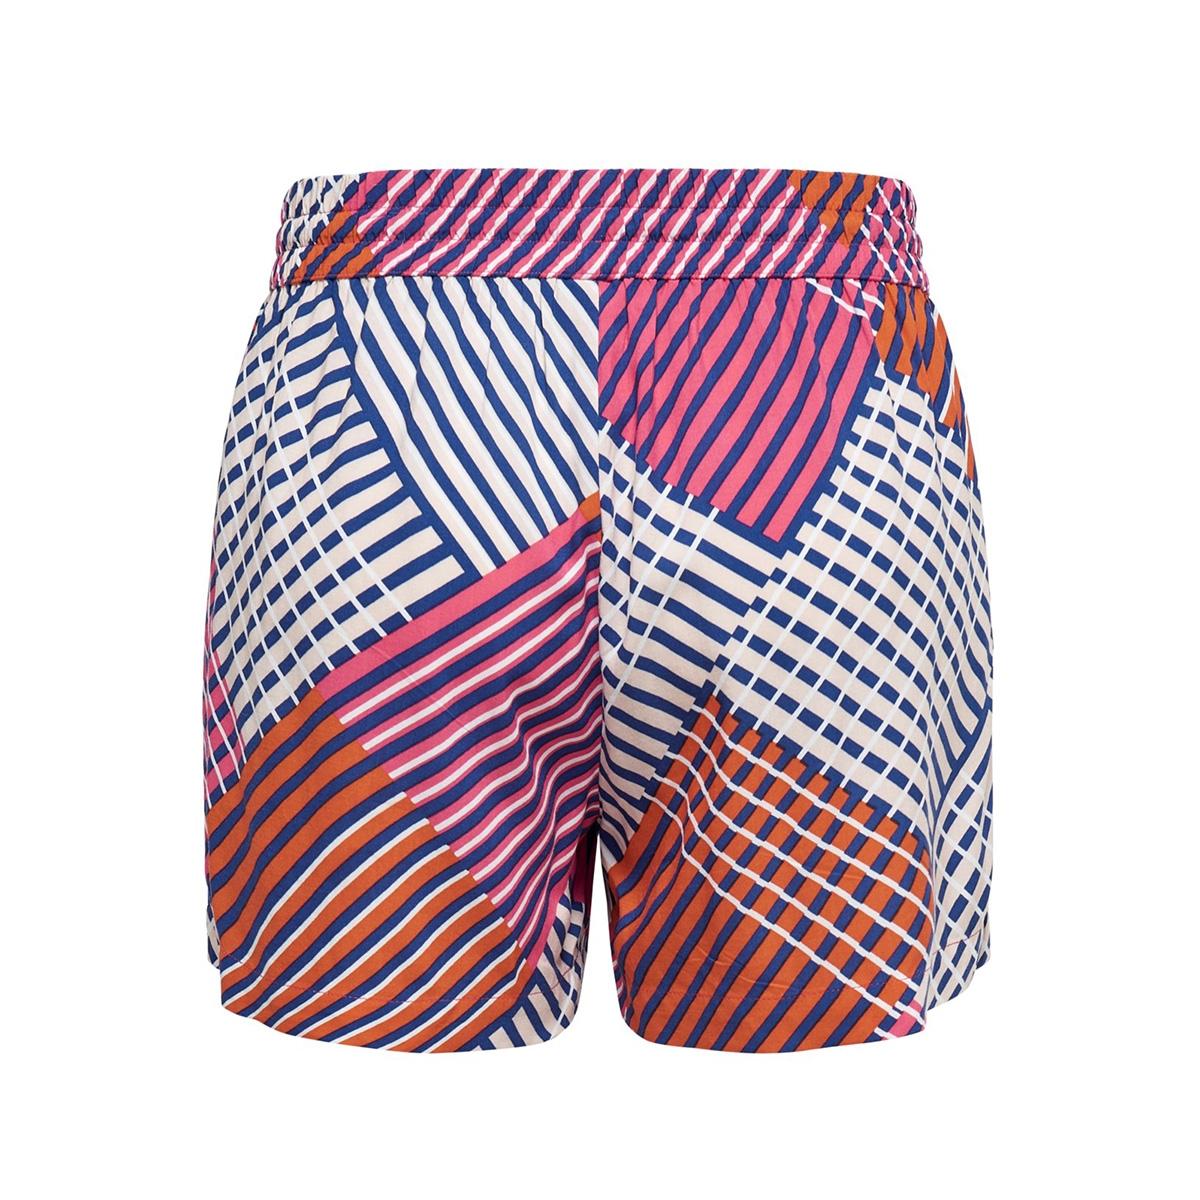 jdystar shorts wvn fs 15171547 jacqueline de yong korte broek cloud dancer/blue pink